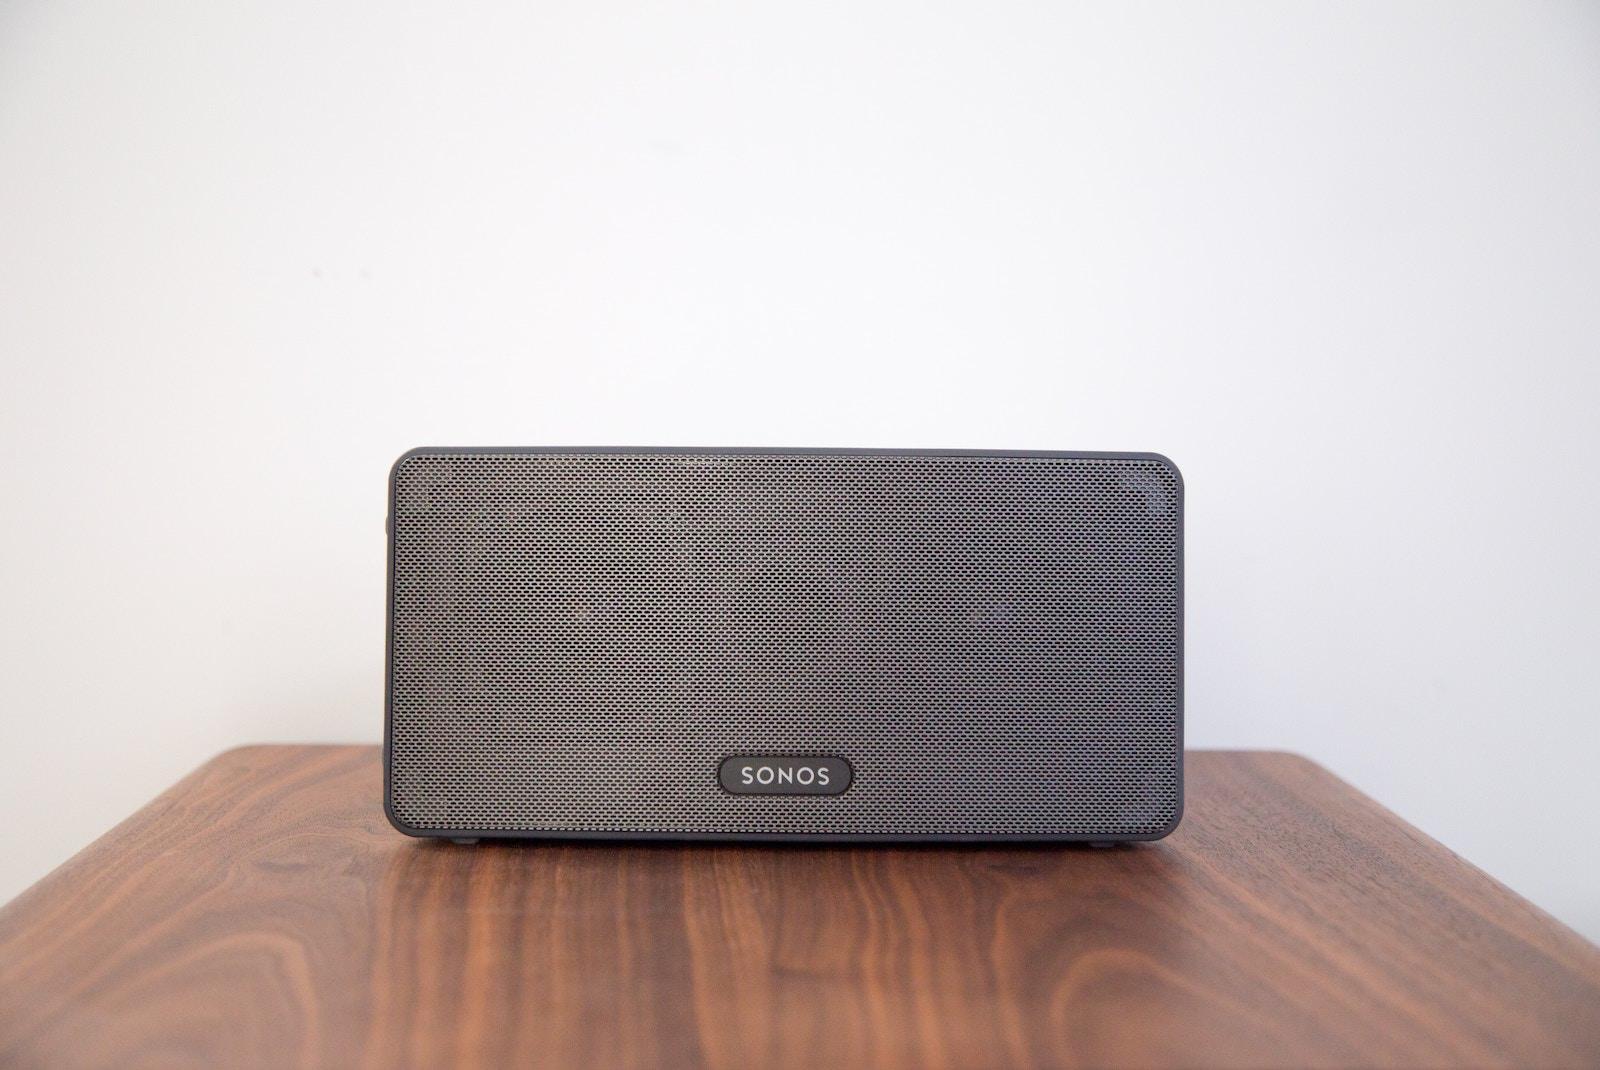 charles-deluvio-457865-unsplash-sonos-speakers.jpg